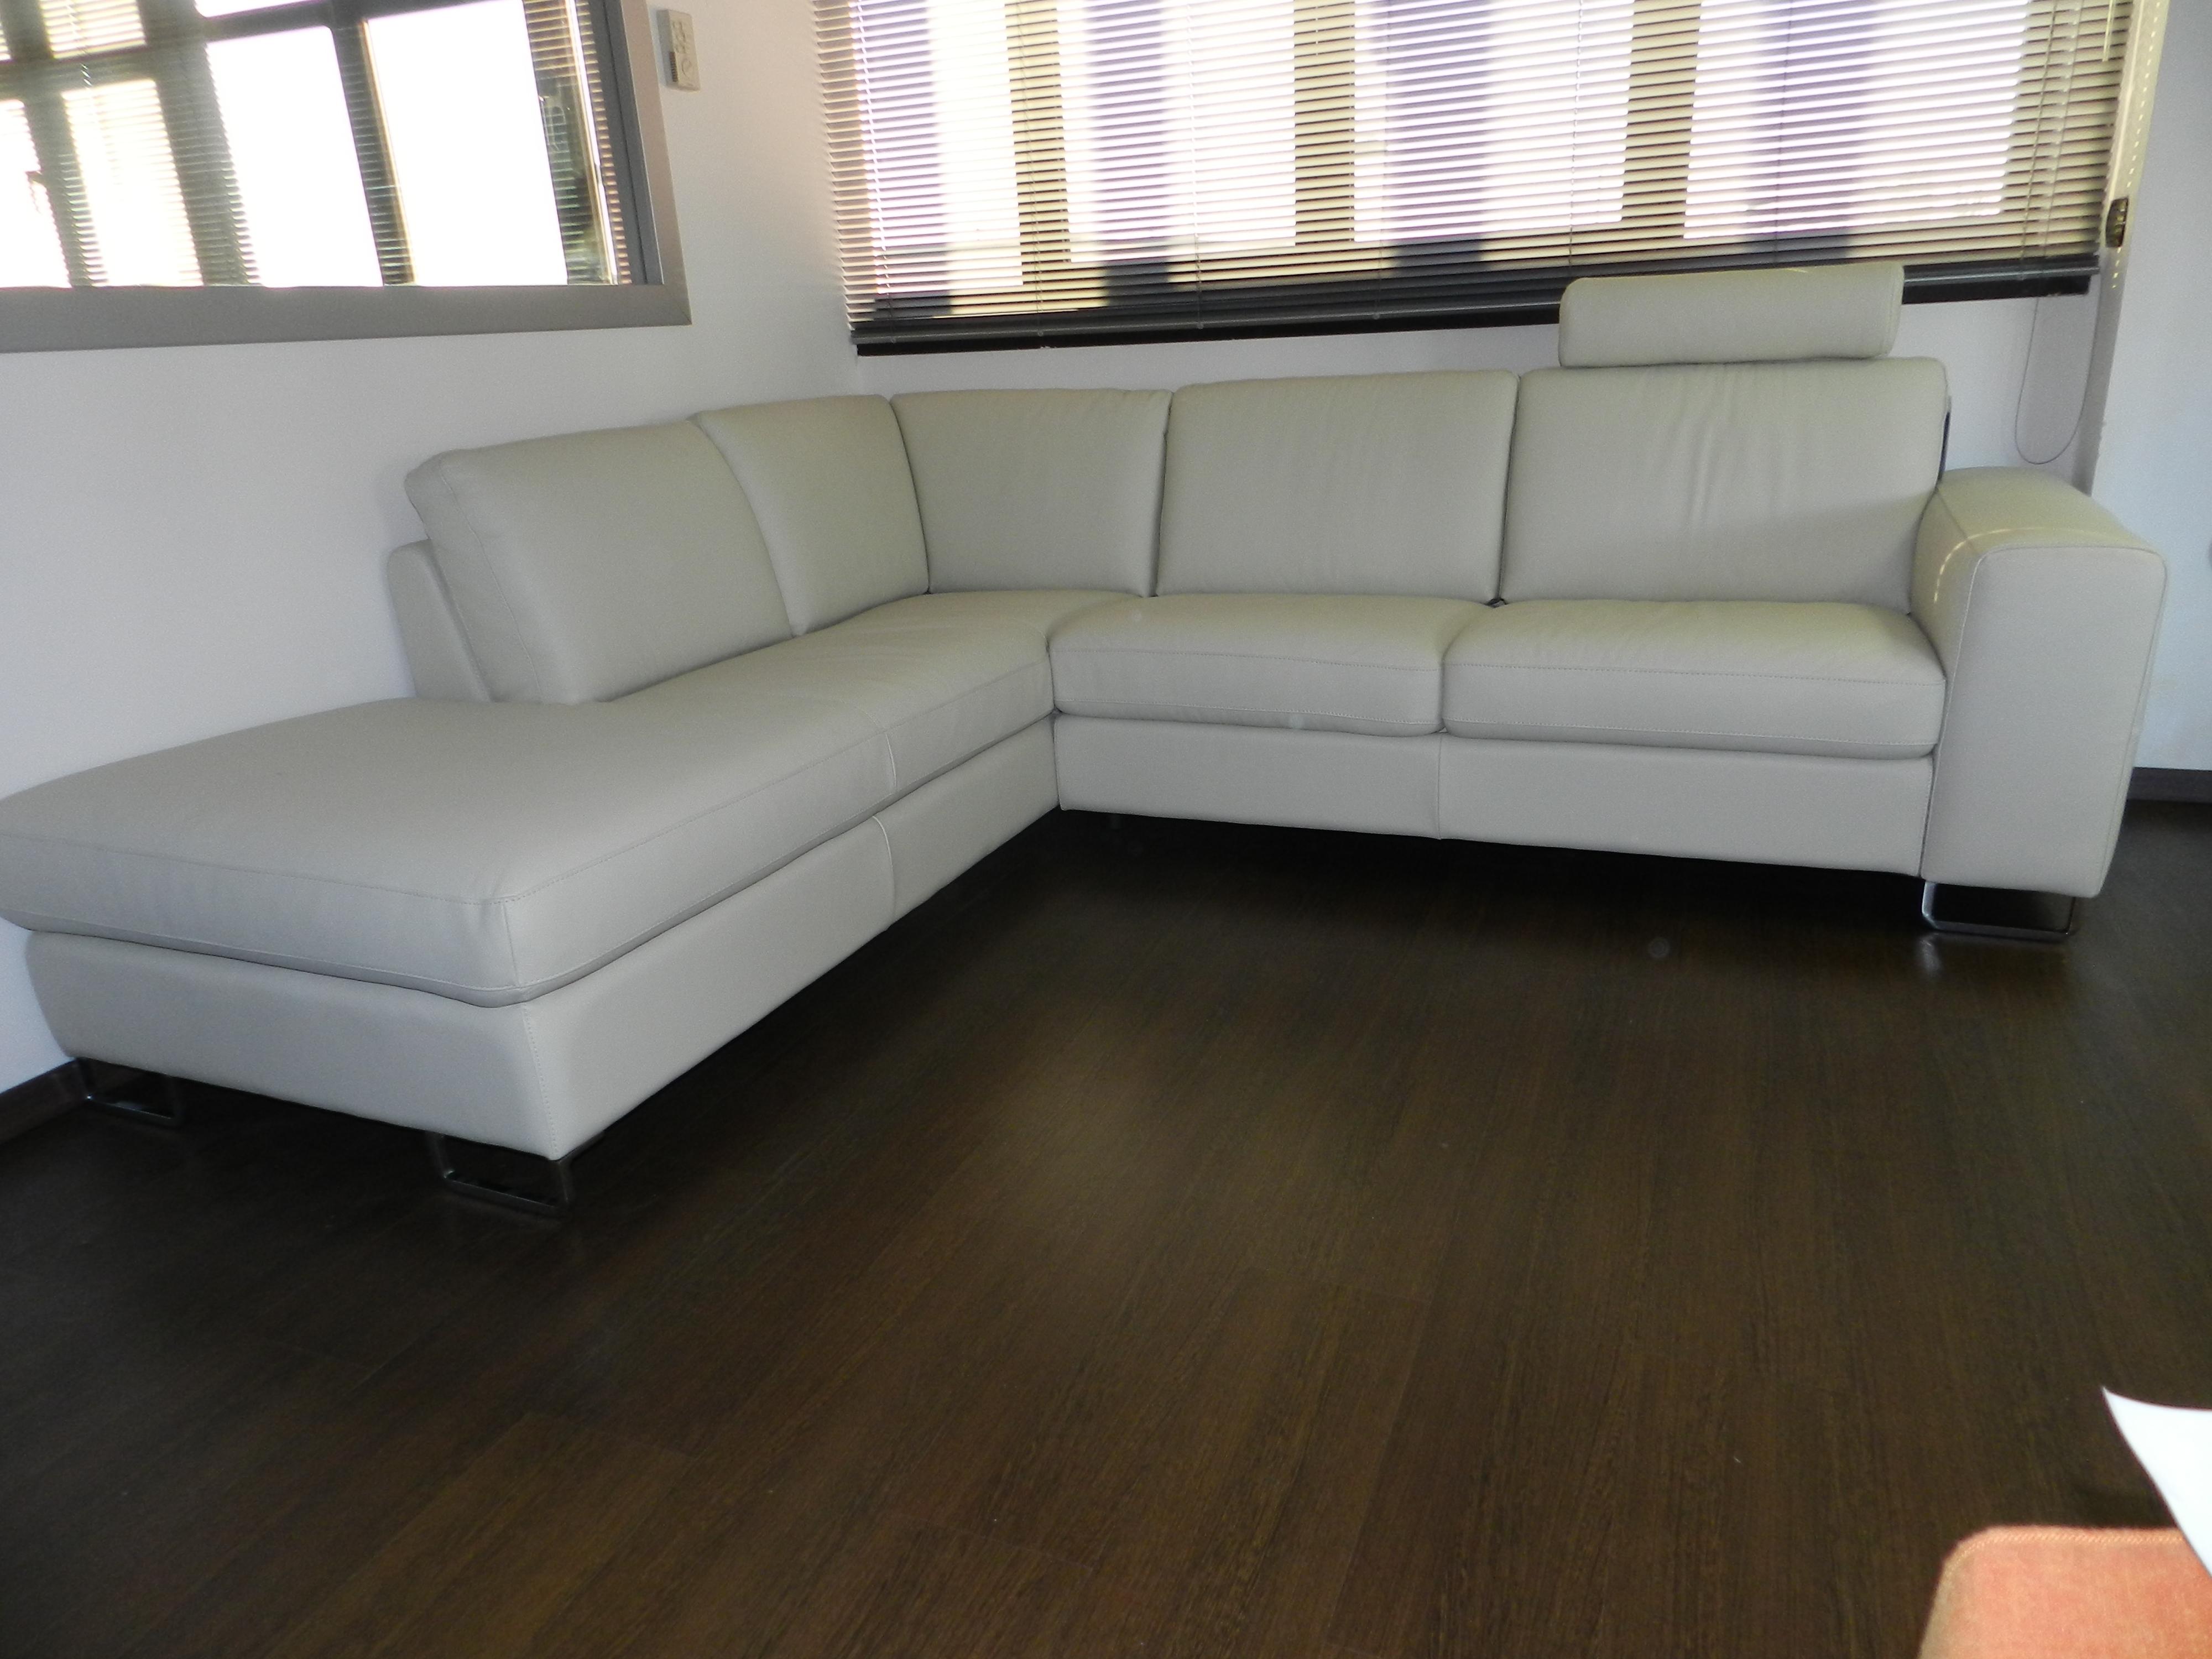 Divano doimo sofas richy divano pelle divani a prezzi scontati - Doimo sofas prezzi ...